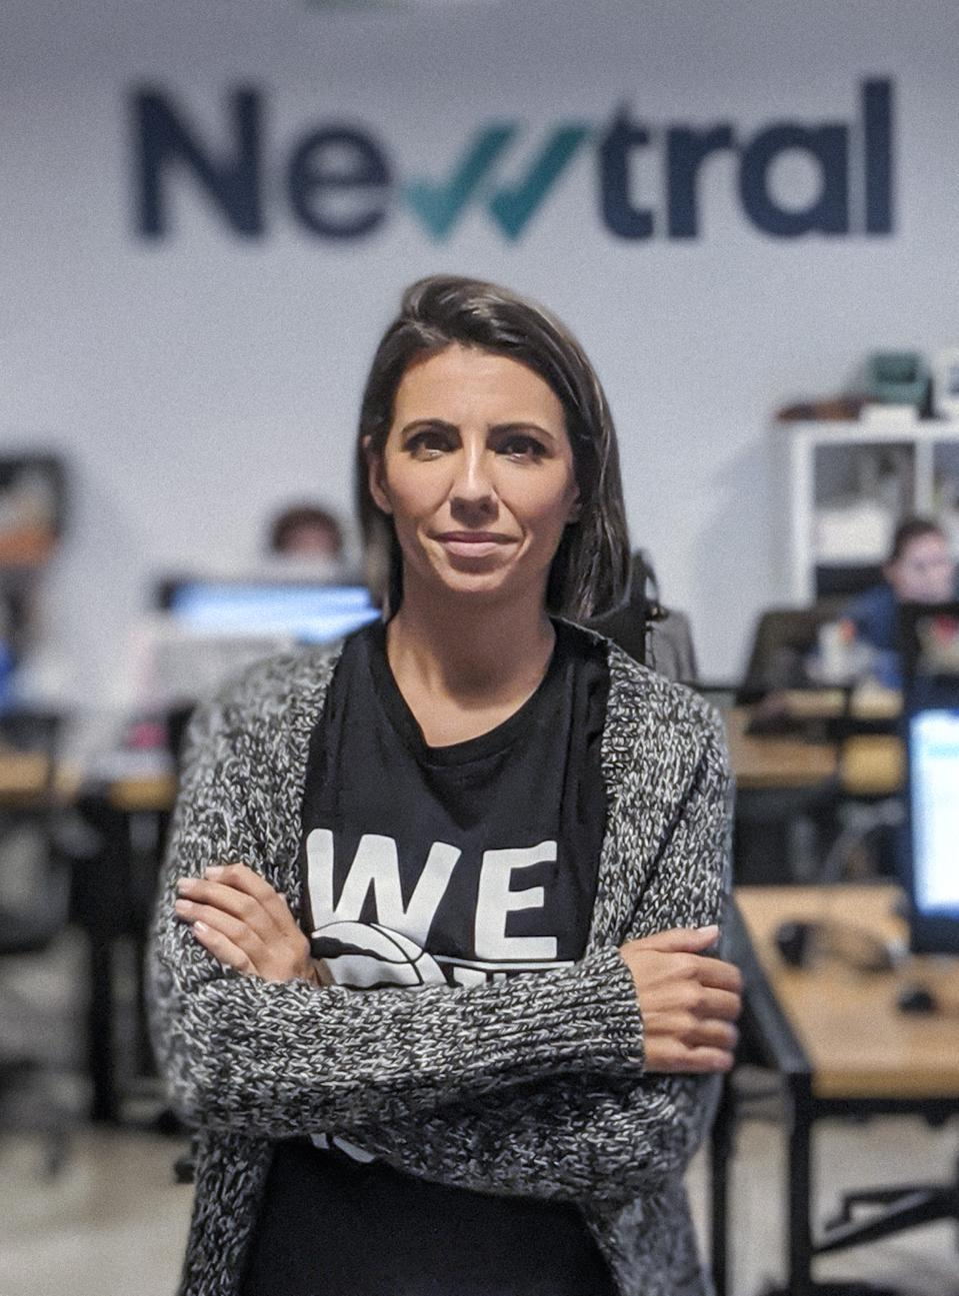 Ana Pastor, founder of Madrid-based media company, Newtral